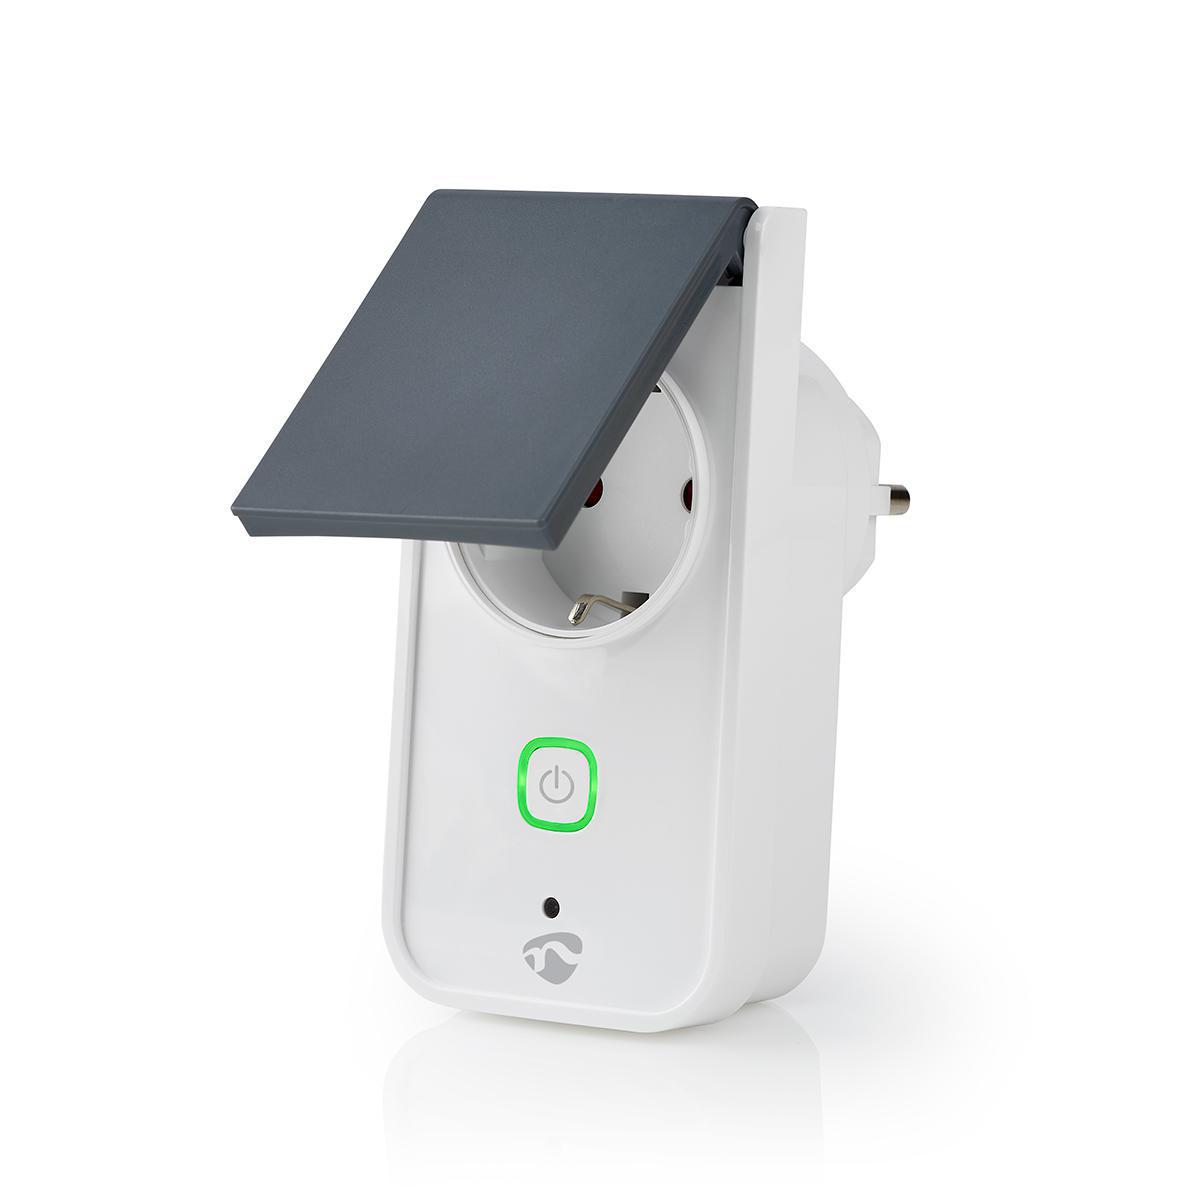 Slimme stekker voor buiten Wi-Fi IP44 spatwaterdicht - zijaanzicht stekker